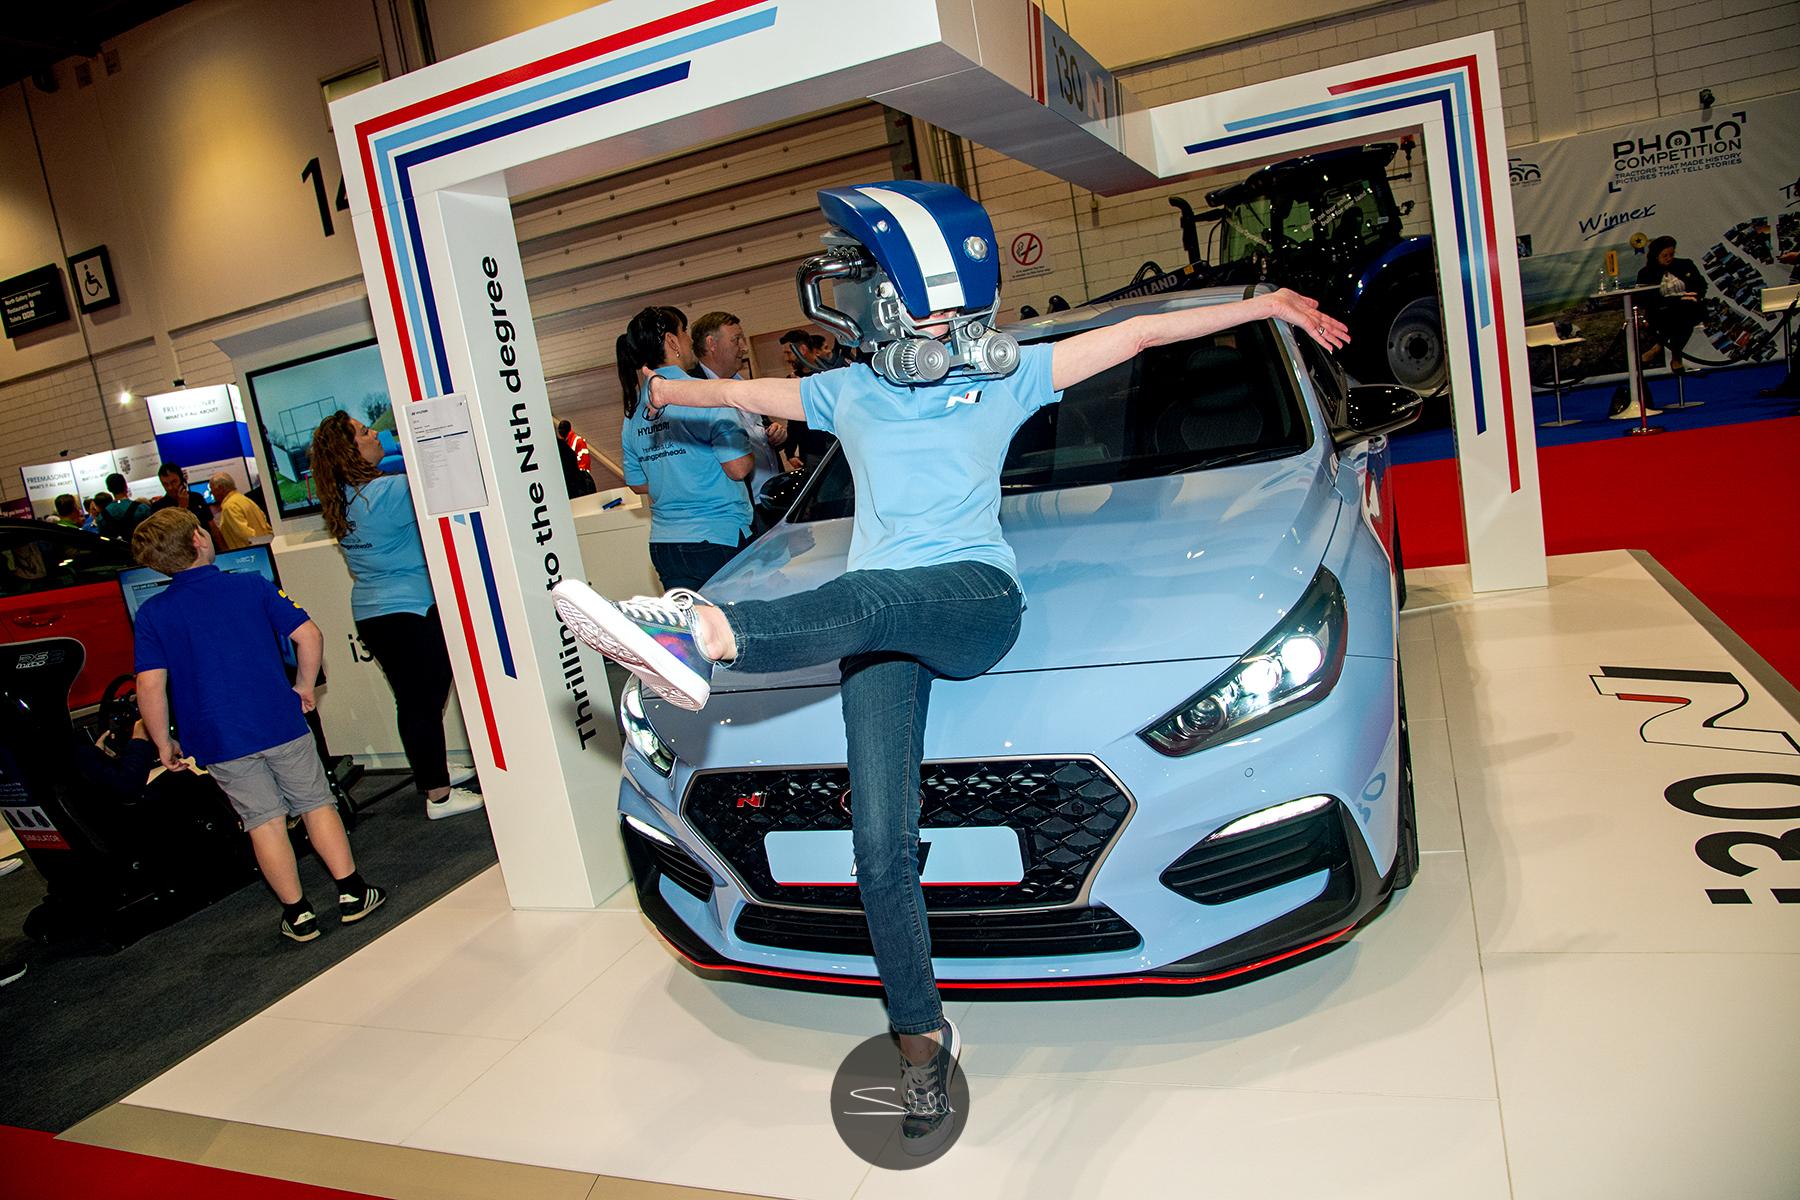 Stella Scordellis The London Motor Show 2018 49 Watermarked.jpg